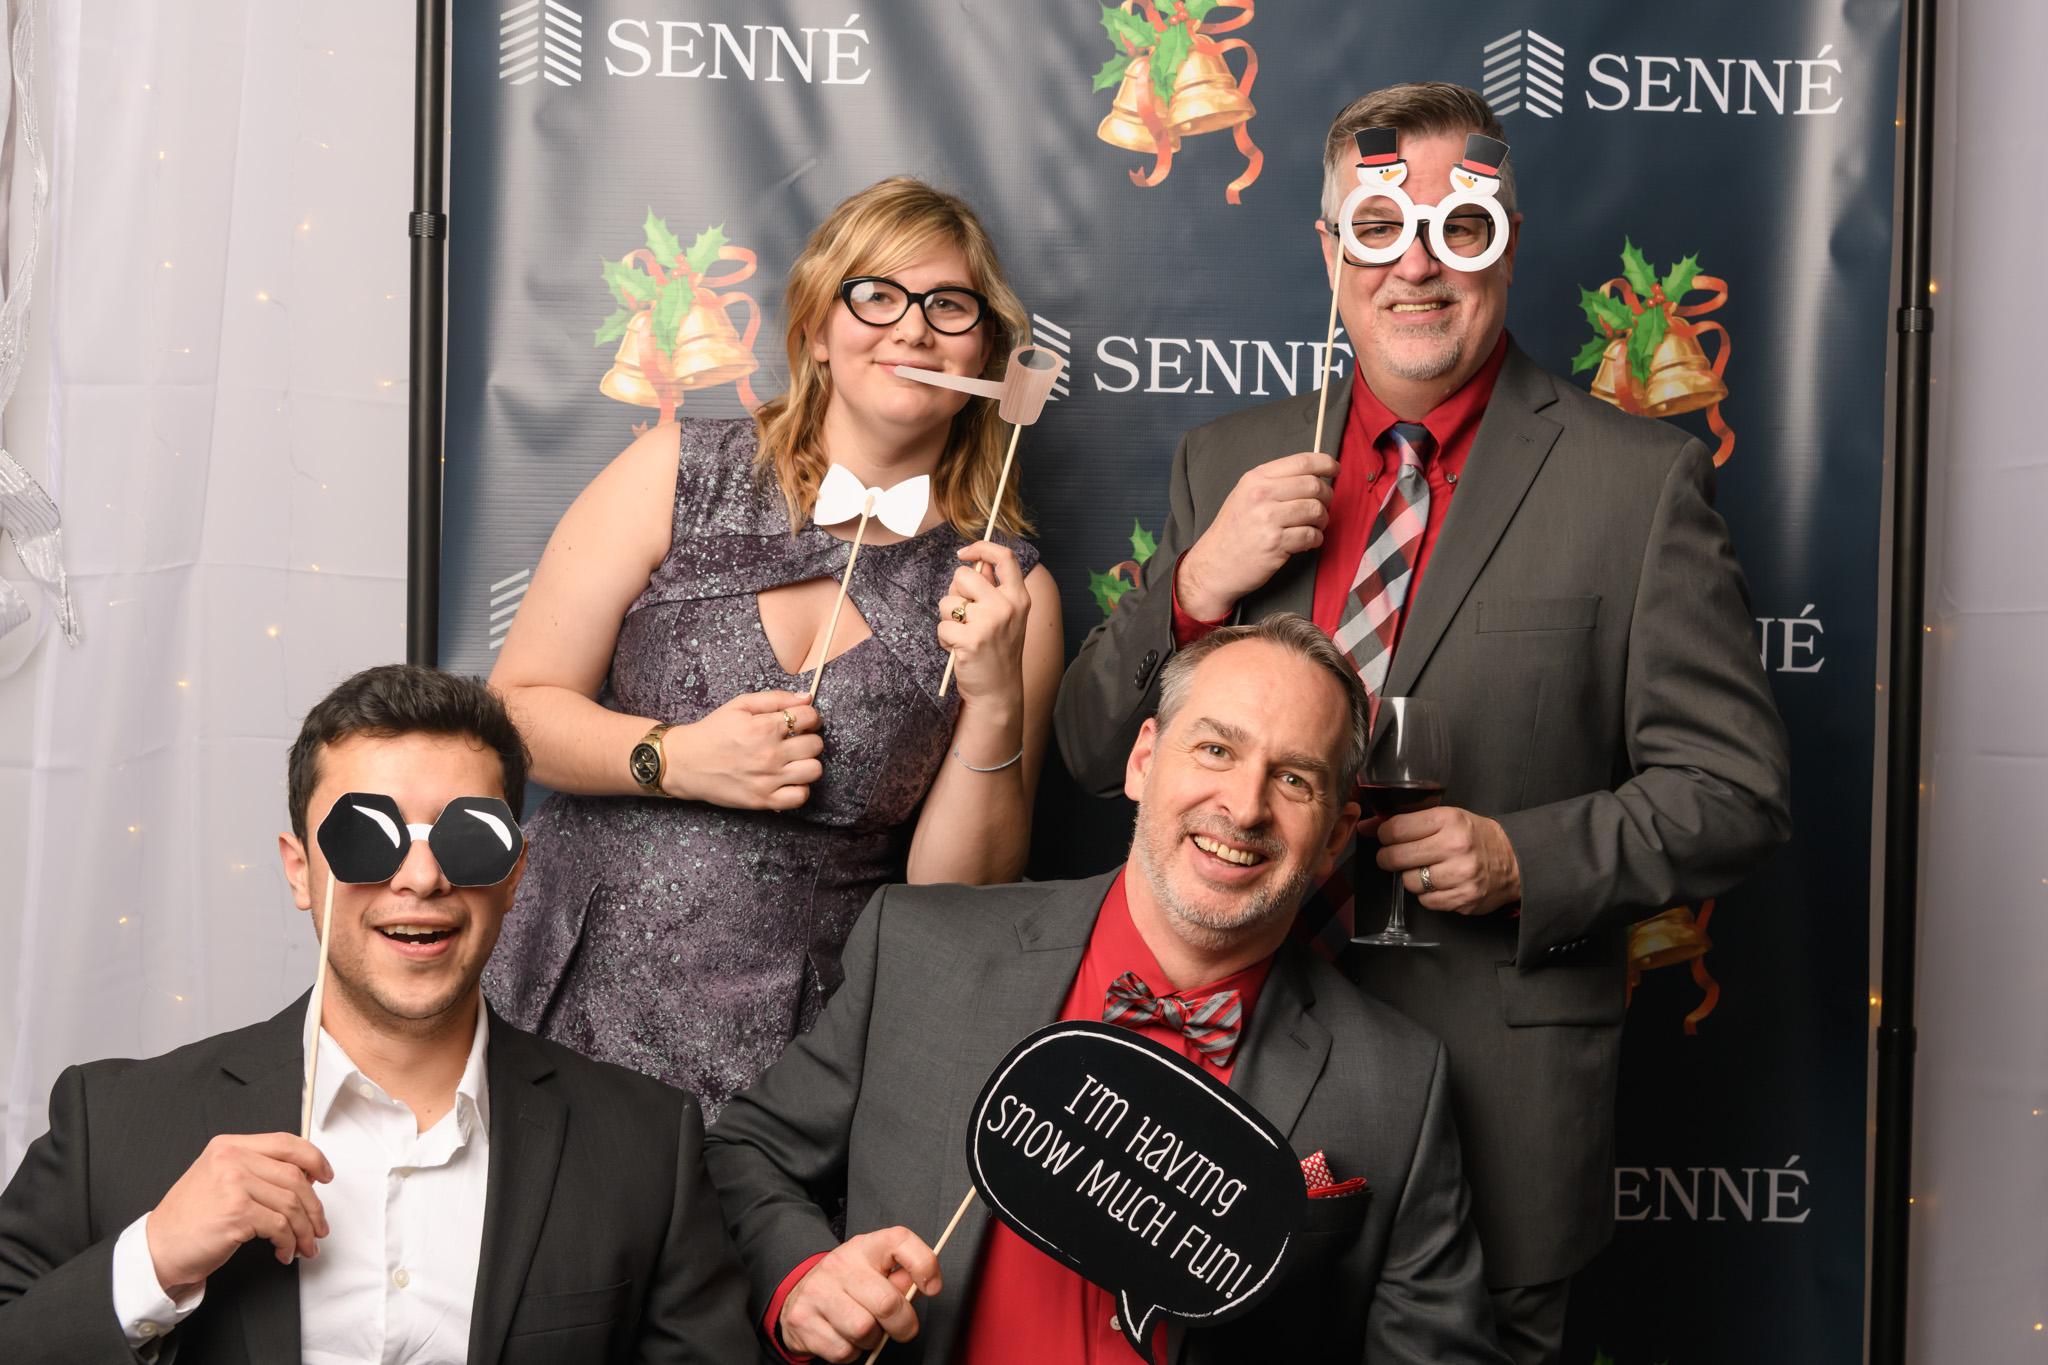 senne-winter-party-2018--0016.jpg